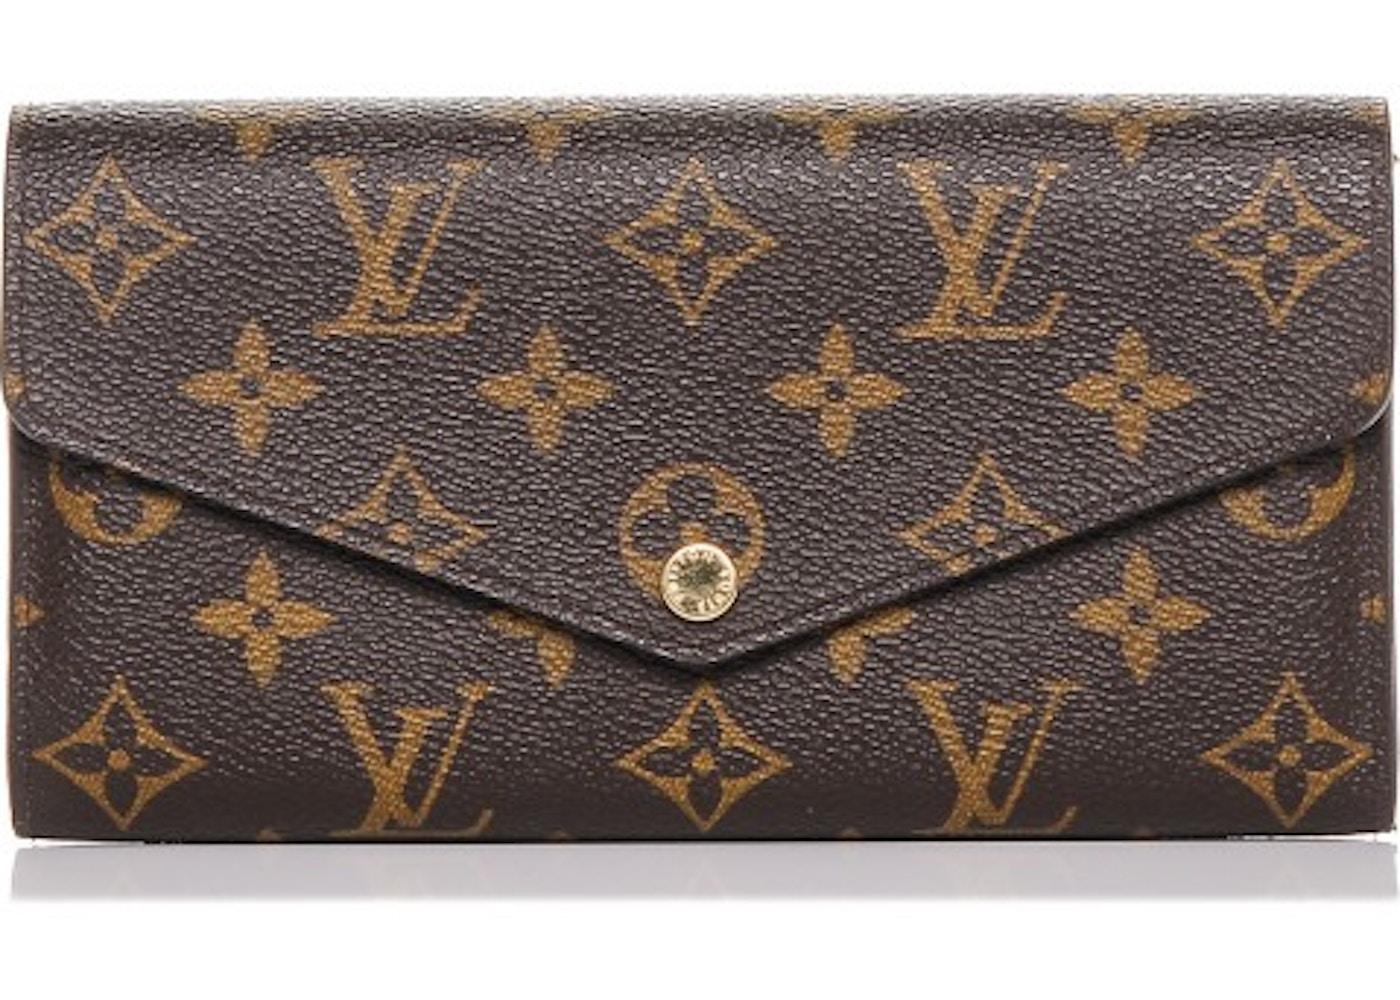 Louis Vuitton Wallet Sarah Monogram NM. Monogram NM 243fd8bc6d9bf